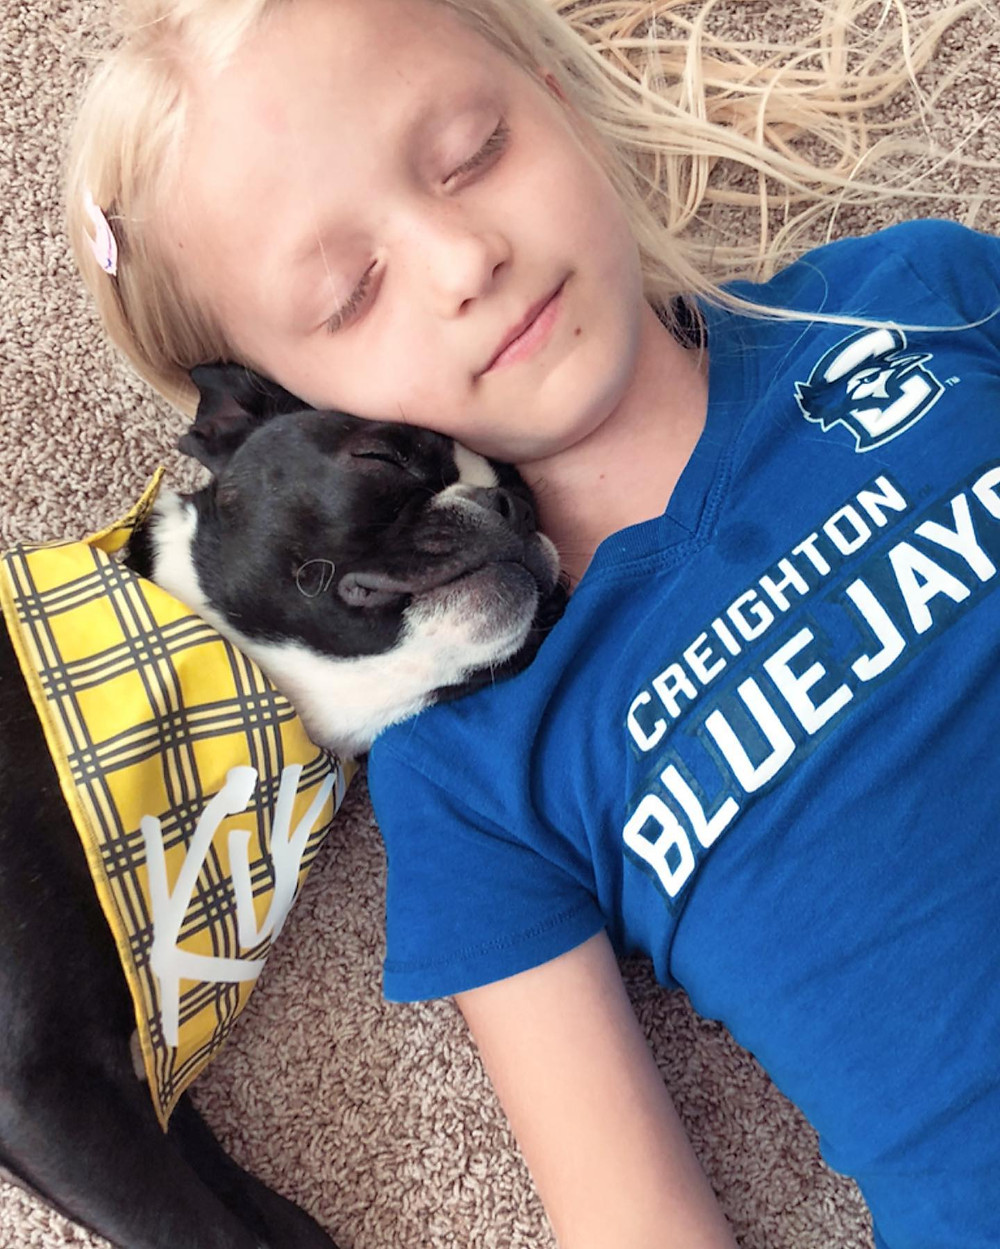 Kiki and small girl, both asleep. Kiki rests his head on her shoulder.